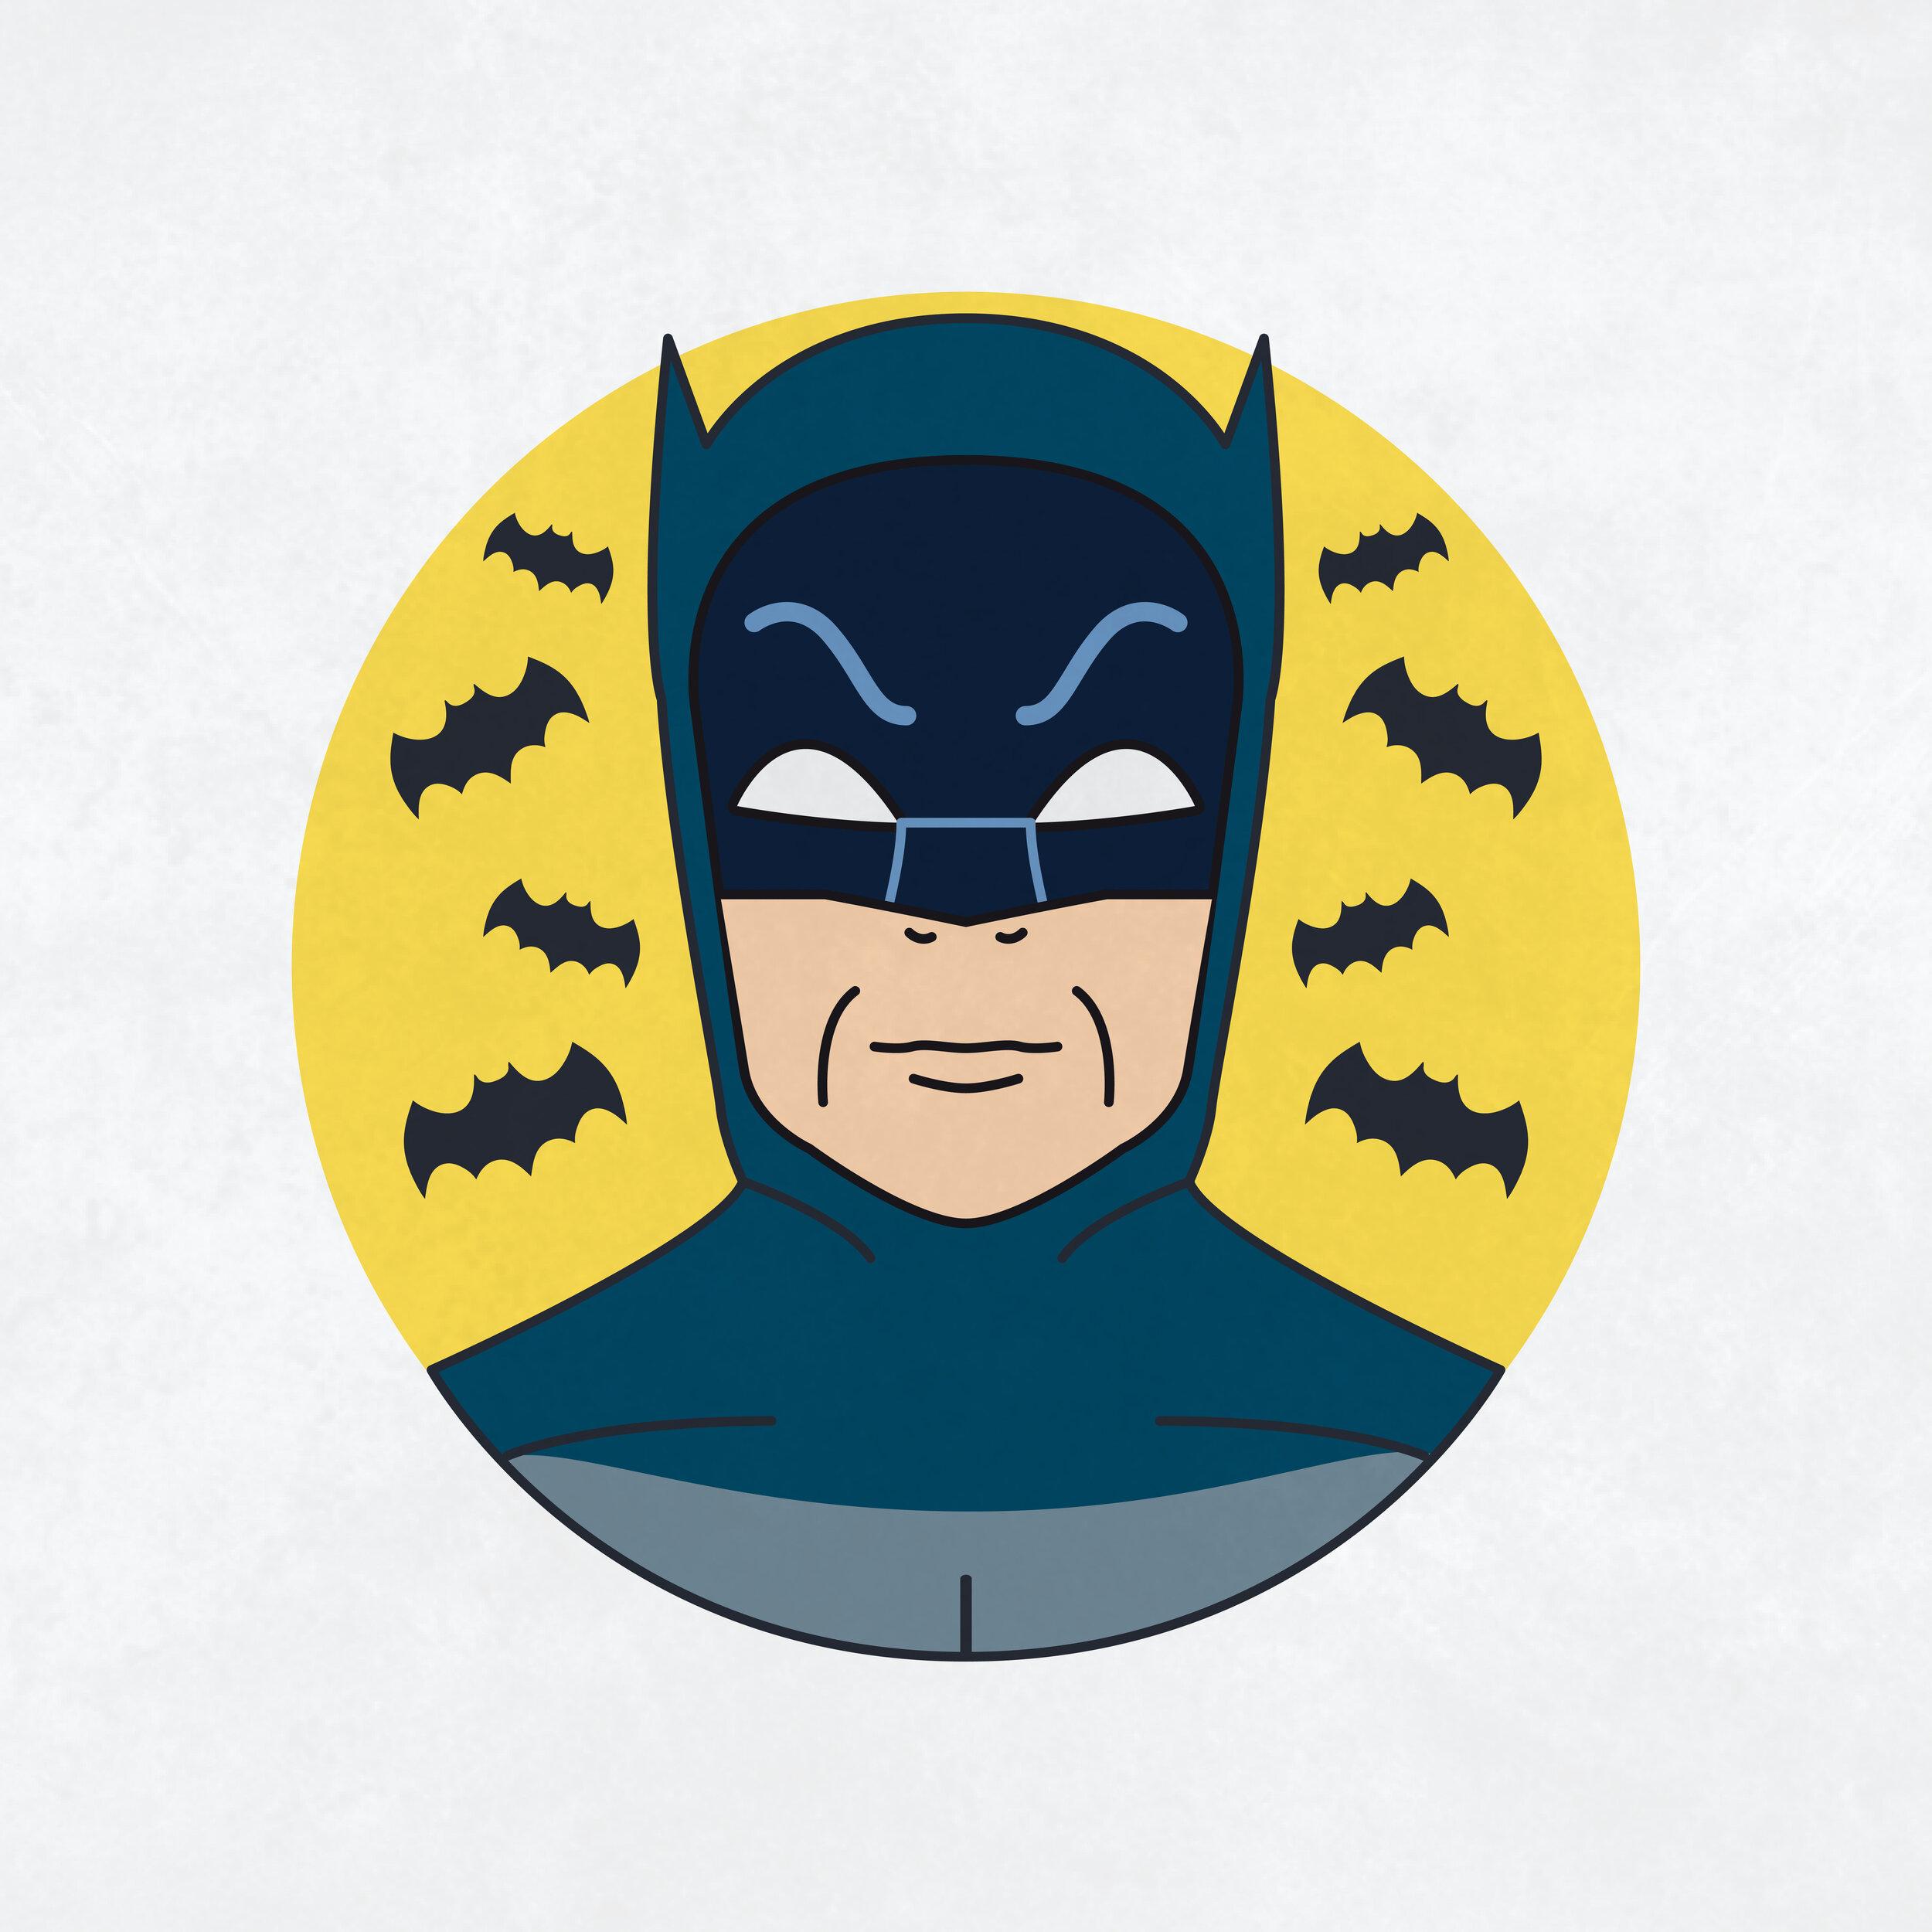 AdamWest-Batman-Illustration-NickBudrewiczDesign-01.jpg